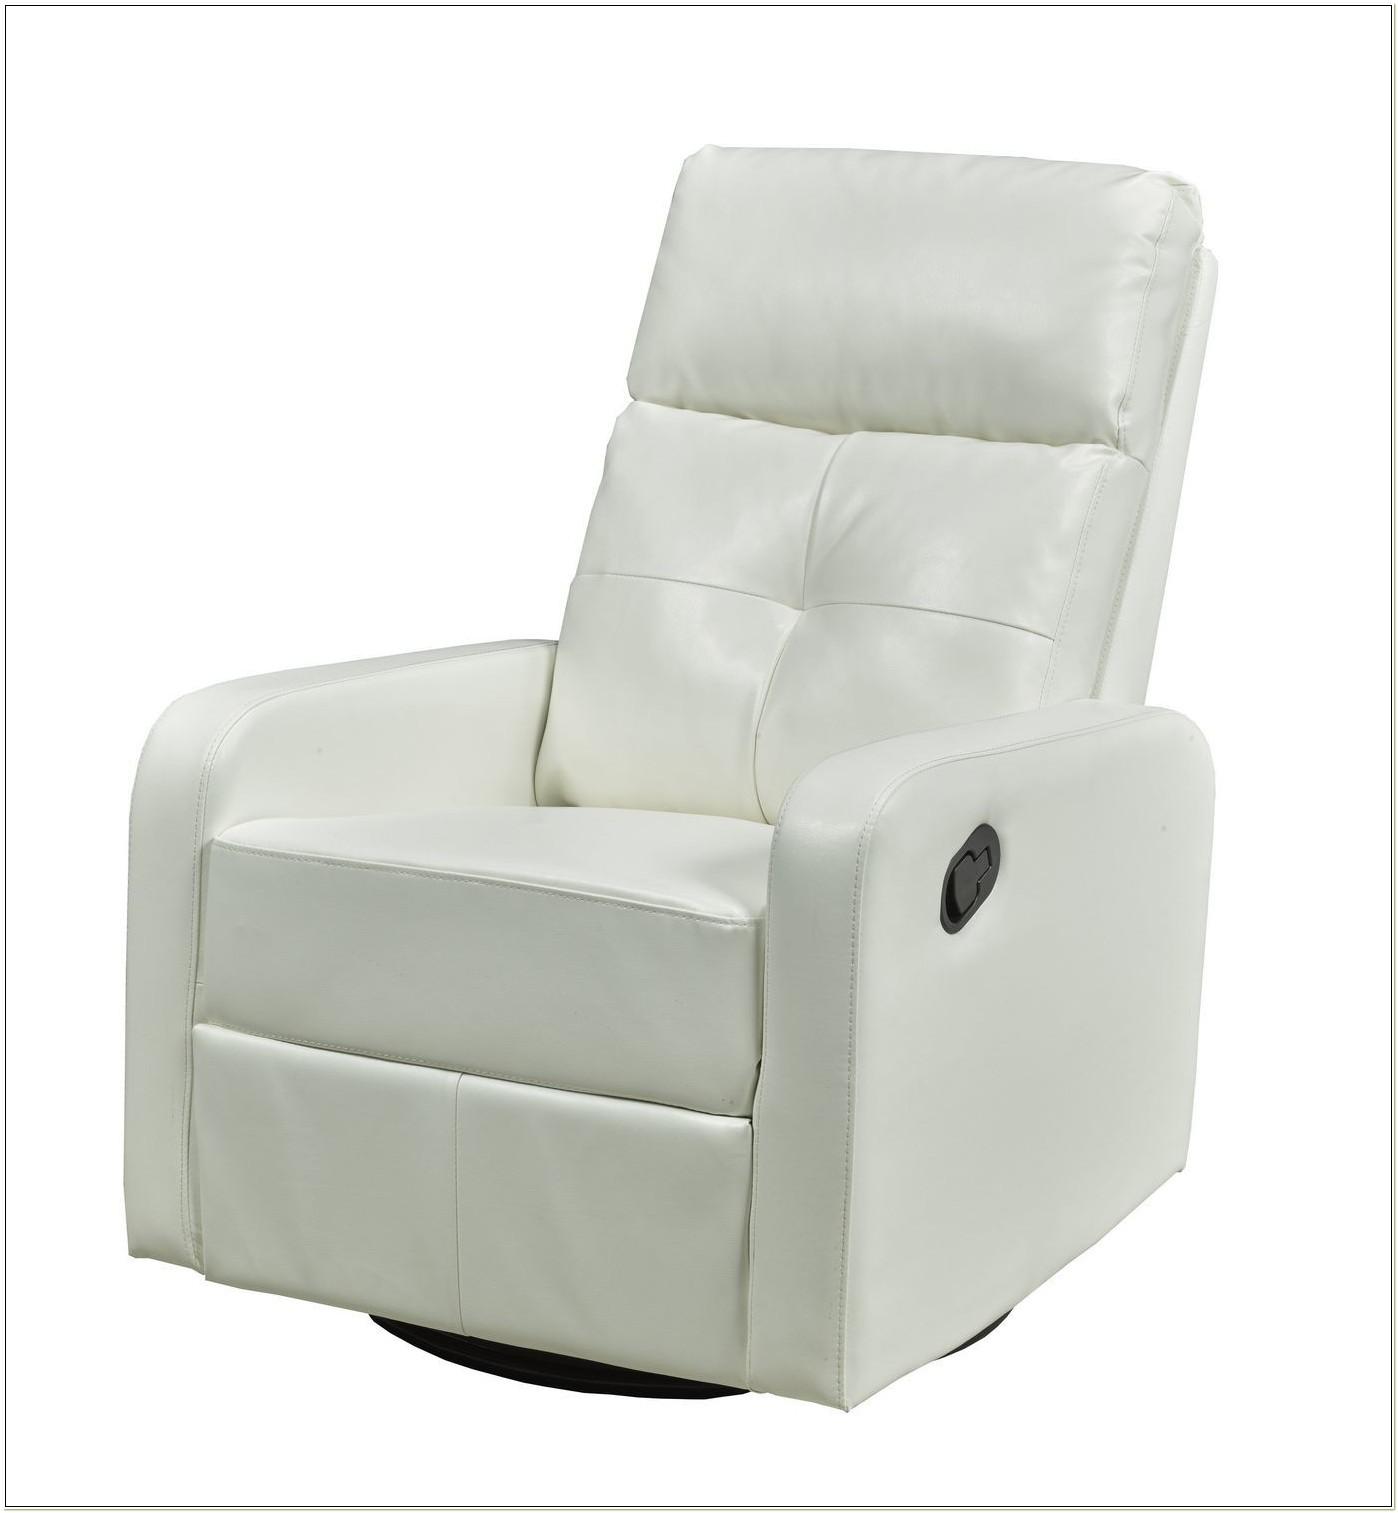 Recliner Chair Walmart Canada